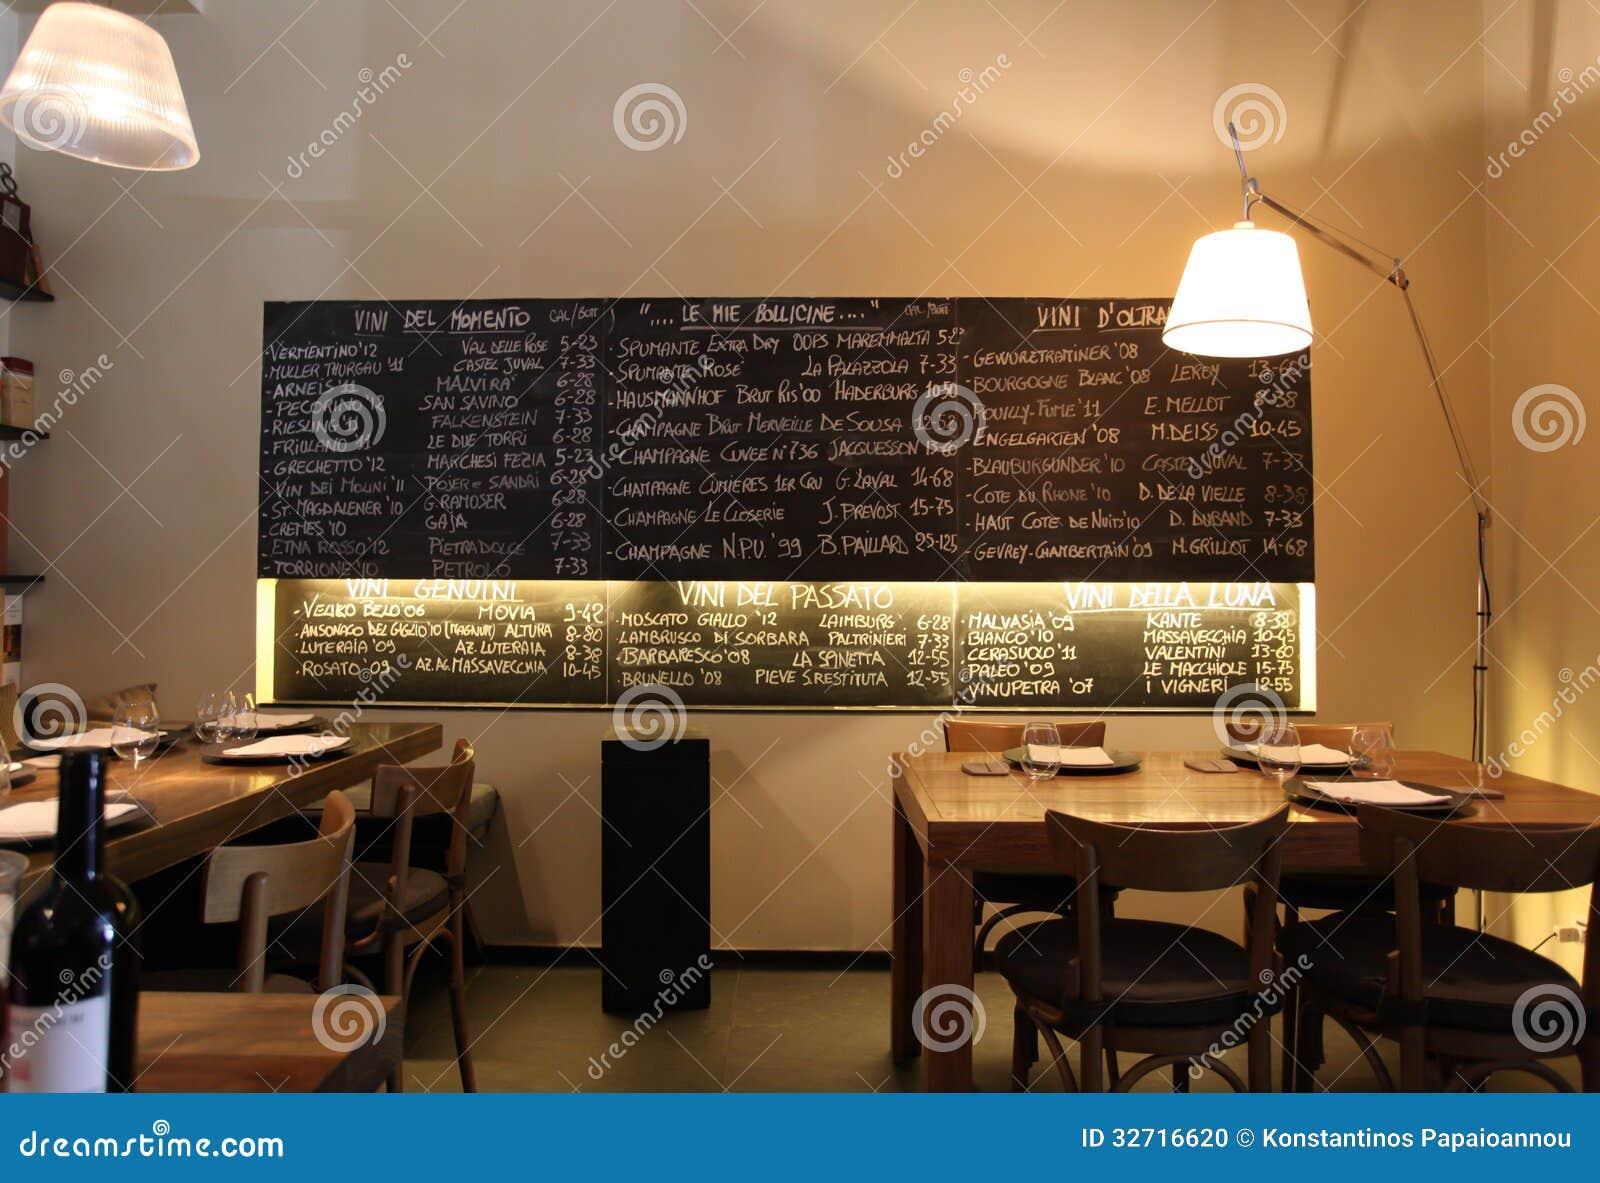 Italian restaurant editorial image of menu product